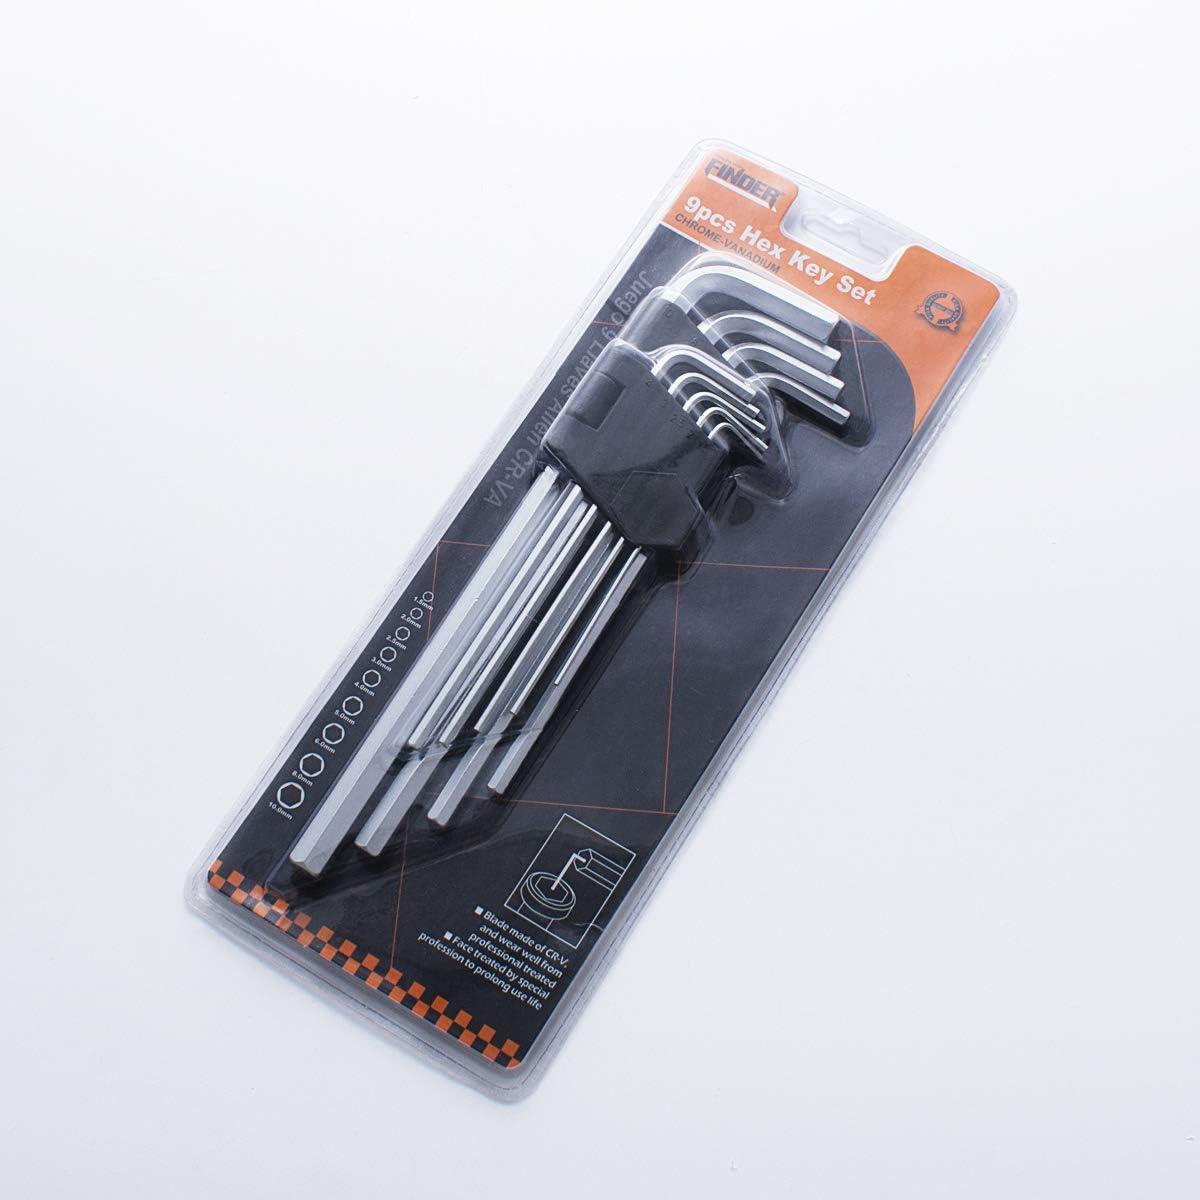 FINDER XJ193124P Arm Hex Key Wrench Set Chrome Vanadium set of 9 pieces,Extra Long Metric